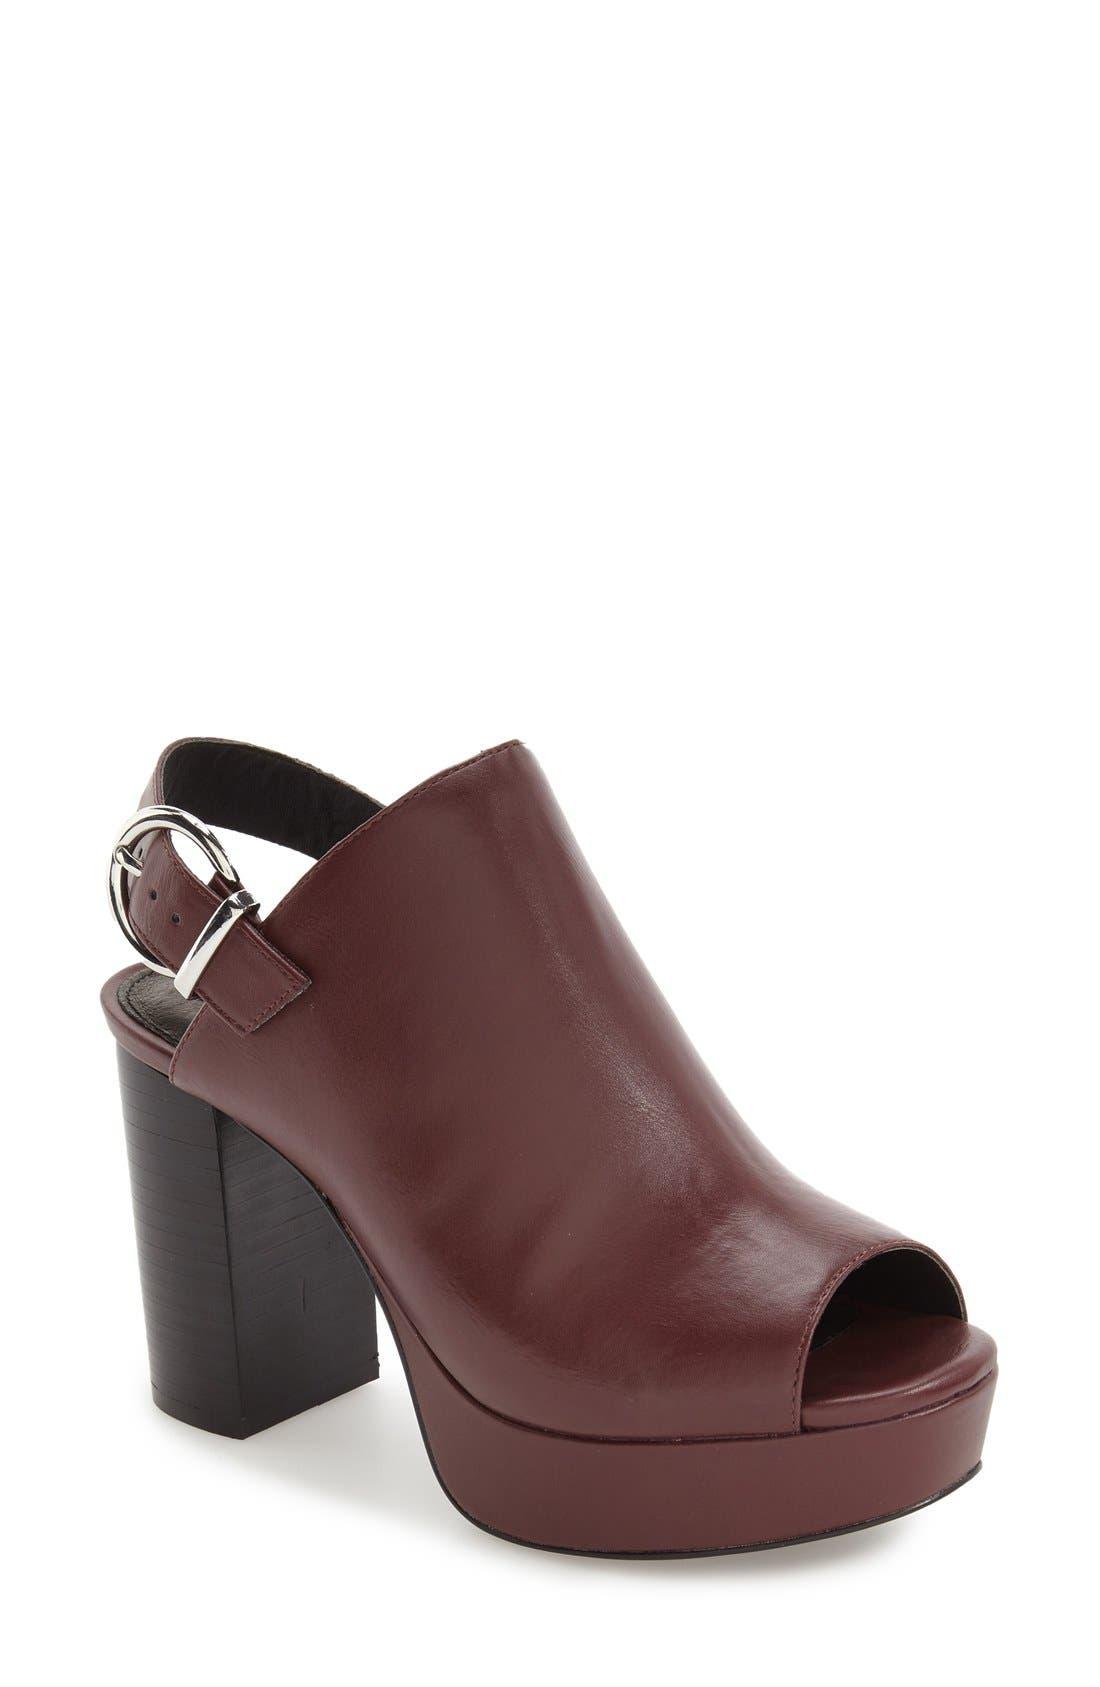 Alternate Image 1 Selected - Topshop 'Liquorice' Platform Sandal (Women)